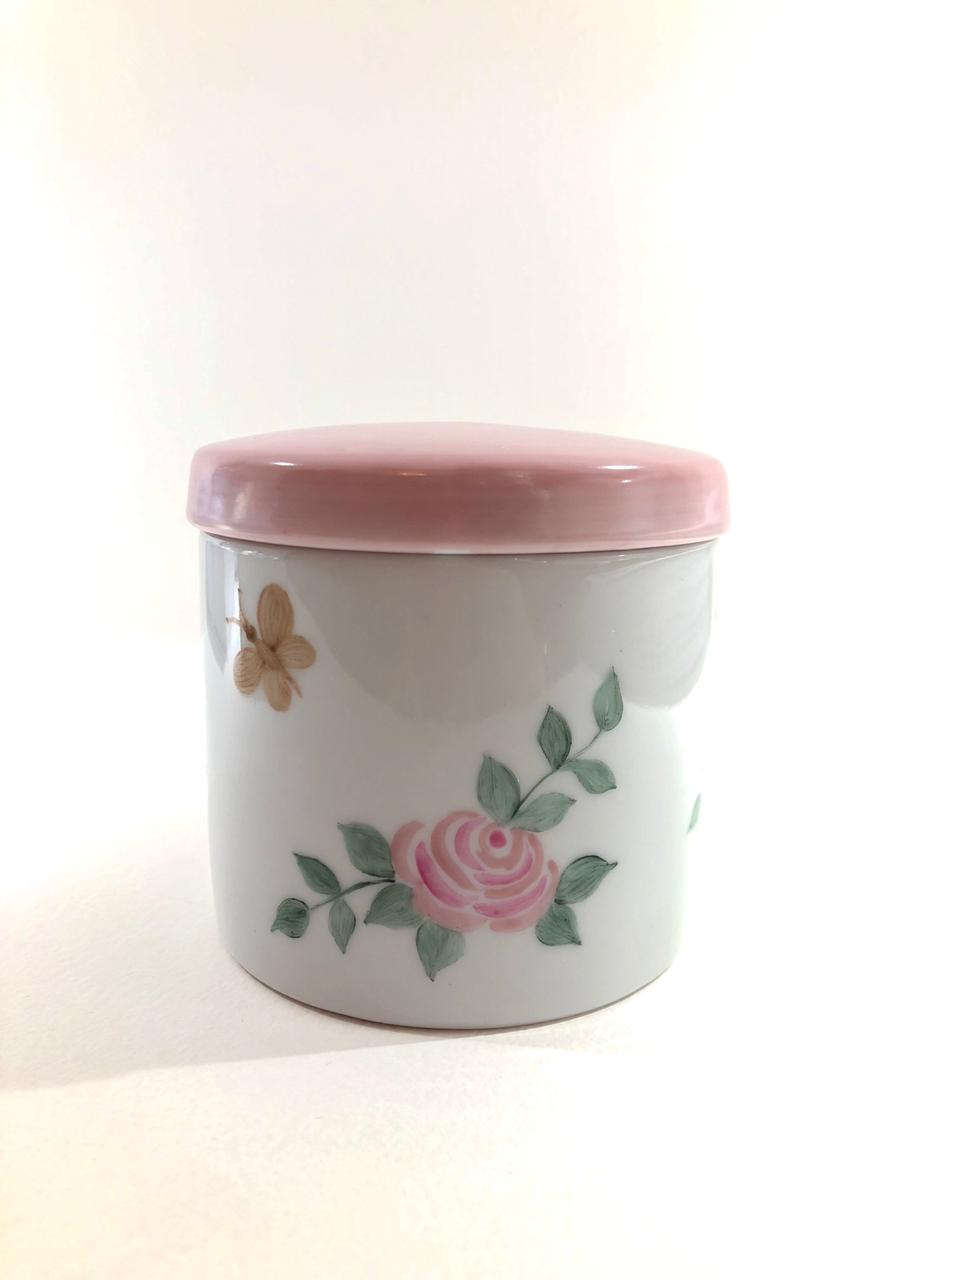 Kit higiene Puro Amor com capa bordada – 6 peças